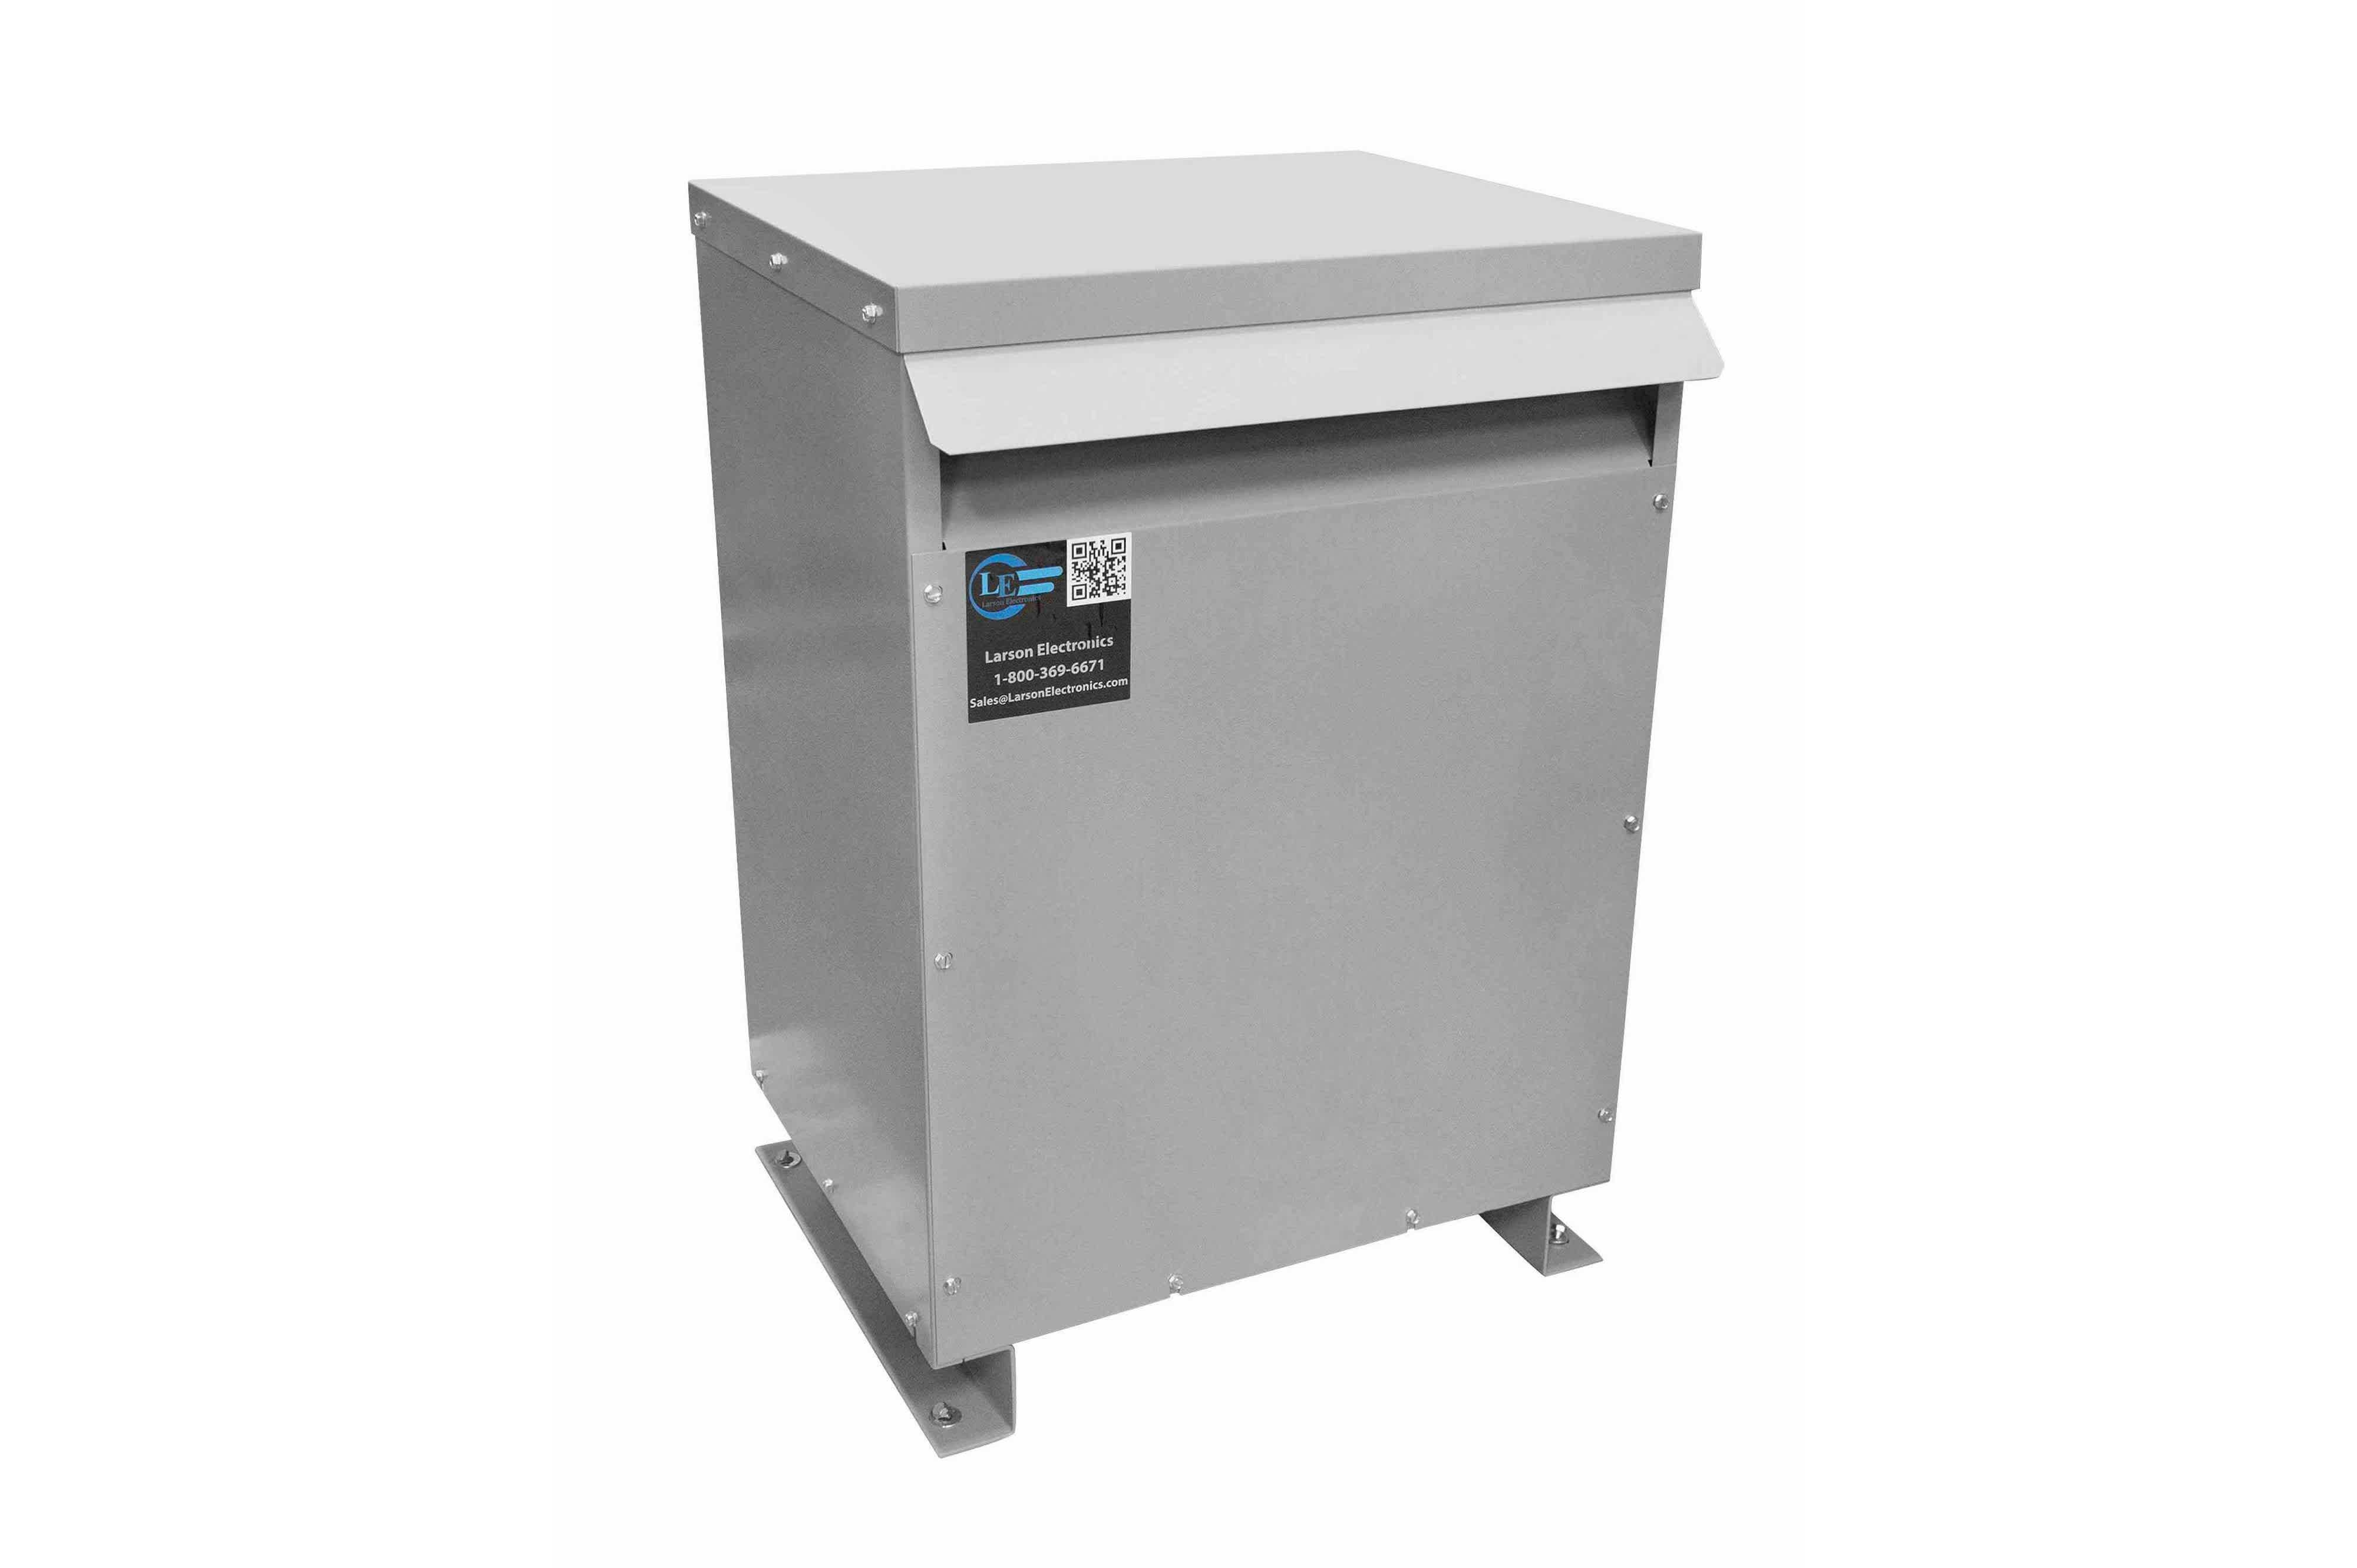 112.5 kVA 3PH DOE Transformer, 380V Delta Primary, 208Y/120 Wye-N Secondary, N3R, Ventilated, 60 Hz